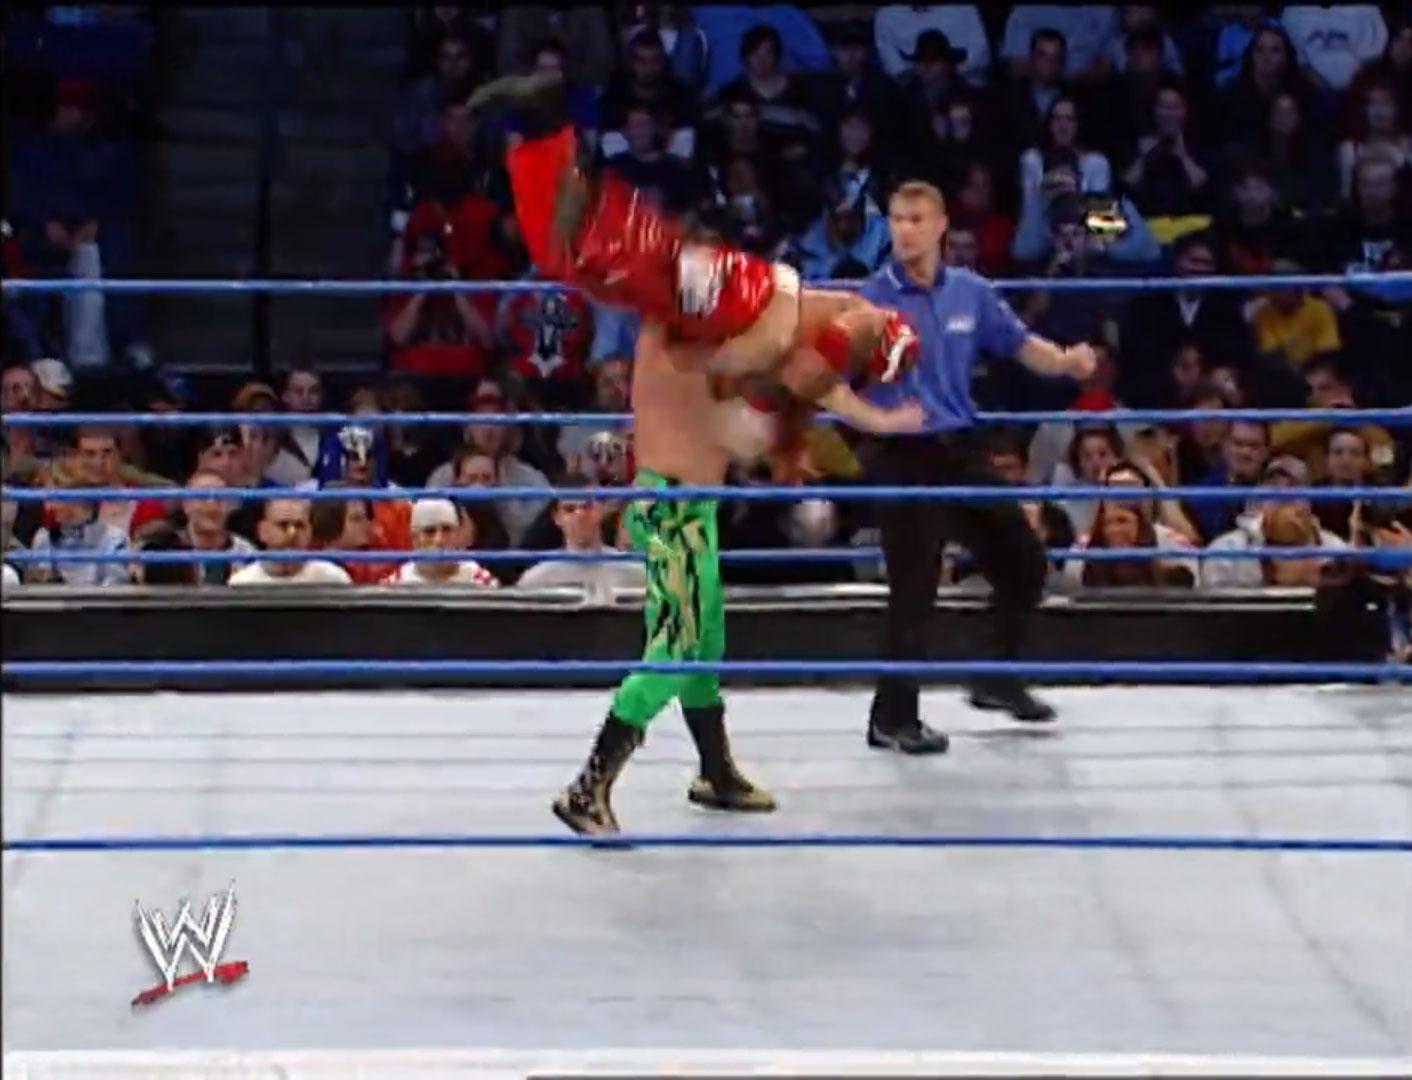 Eddie Guerrero vs. Rey Mysterio WWE Smackdown November 14th 2002